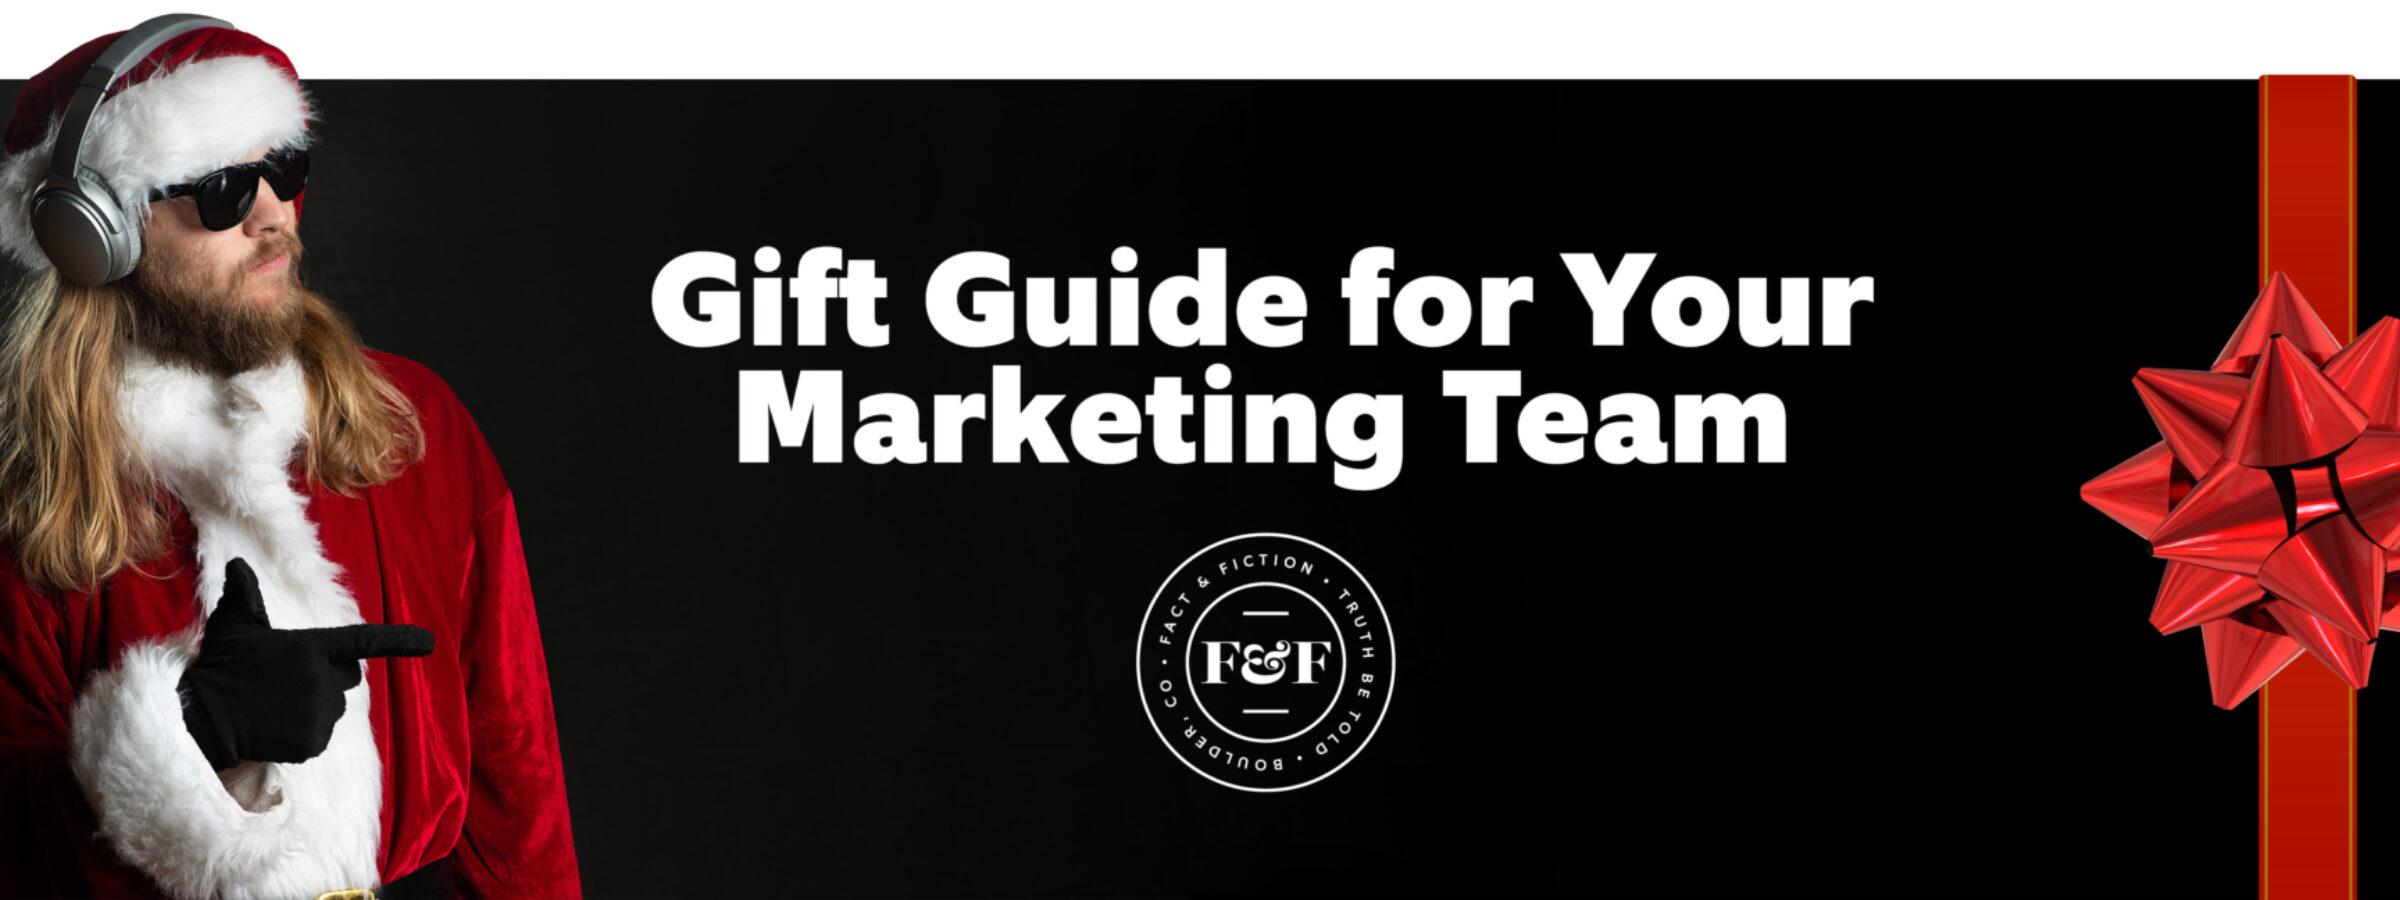 Ff Holiday Gift Guide Banner V9